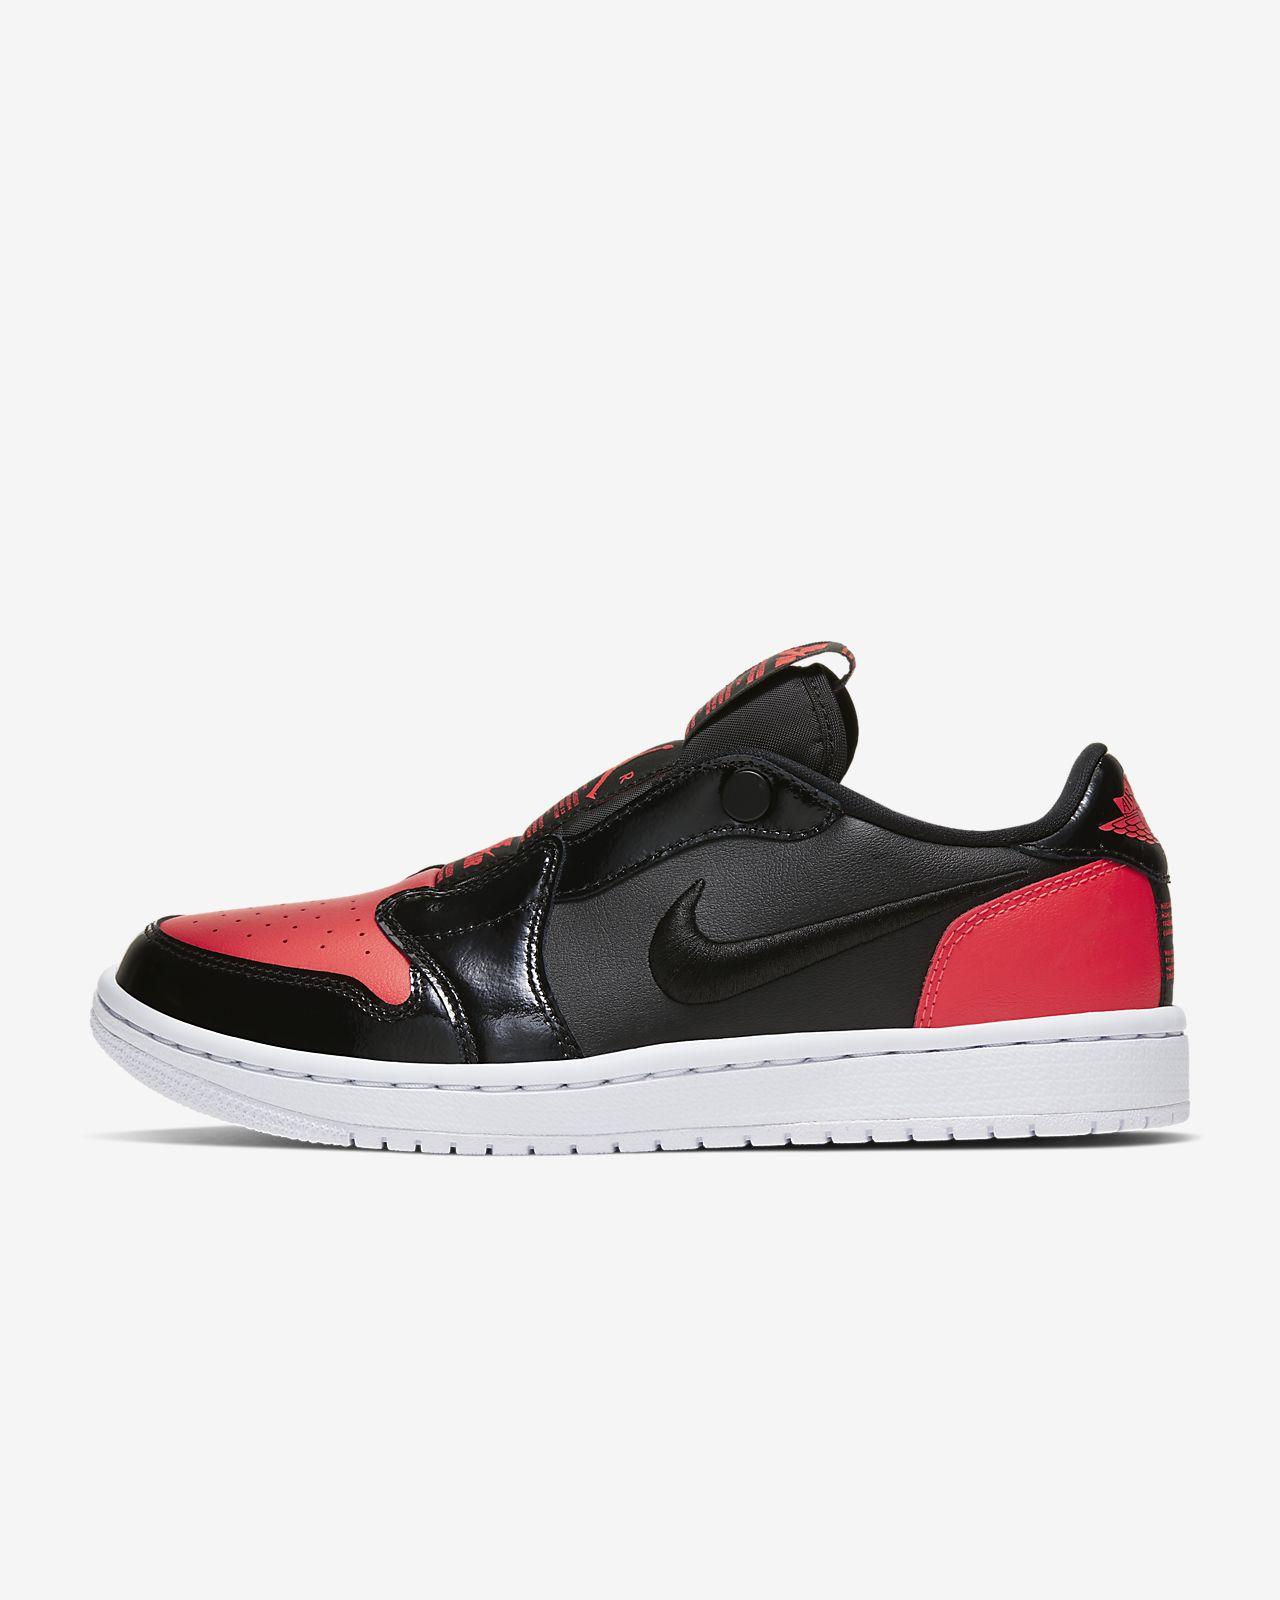 Air Jordan 1 Retro Low Slip Zapatillas Mujer